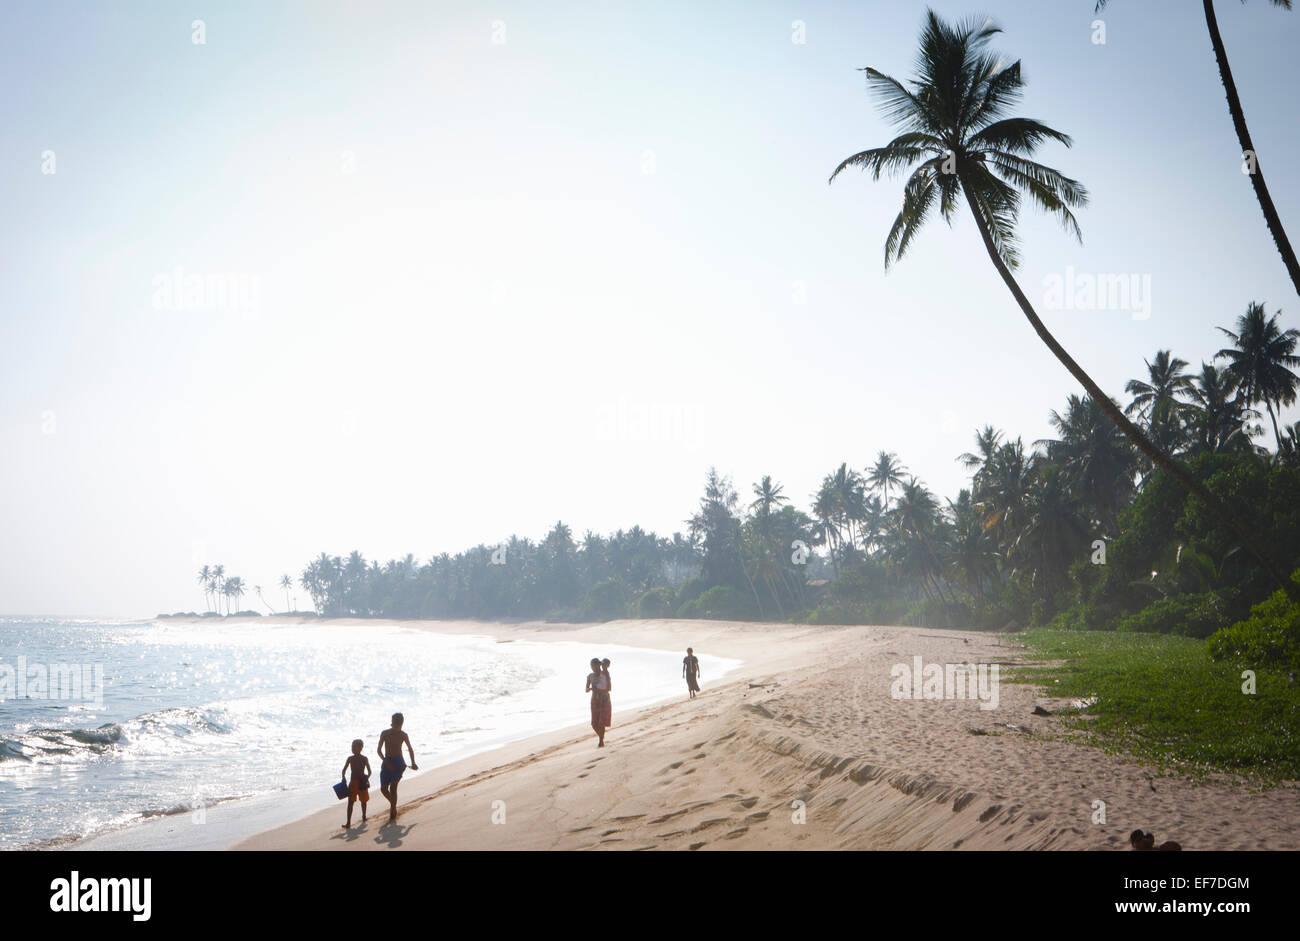 SRI LANKAN FAMILY ON BEACH - Stock Image